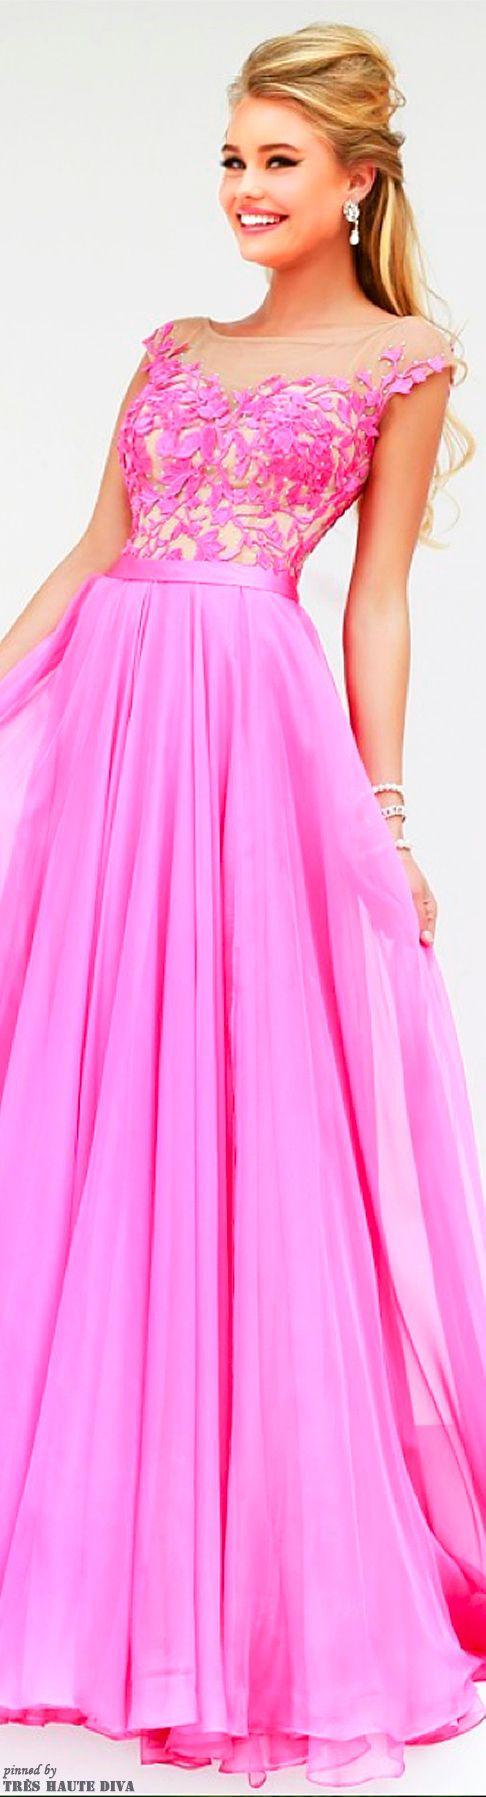 sherri hill longos - Pesquisa Google | diseño vestidos | Pinterest ...